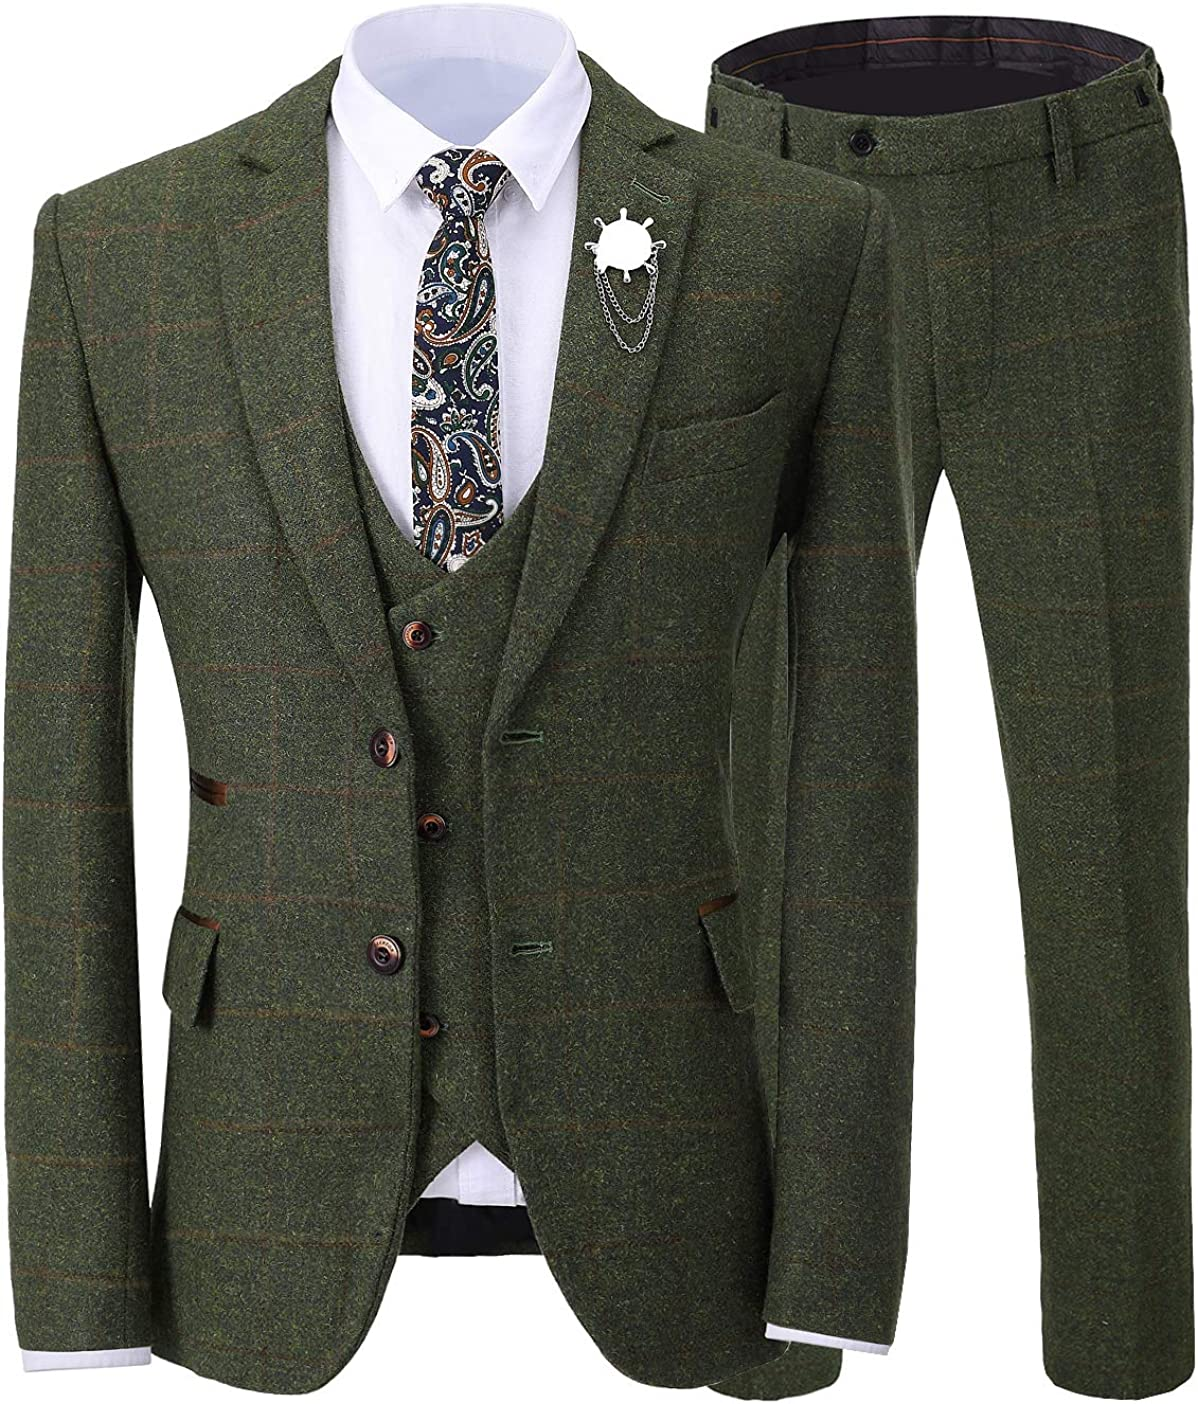 Men's 3 Pieces Formal Tweed Mens Suit Slim Fit Plaid Tuxedos for Wedding Groomsmen(Blazer+Vest+Pant)